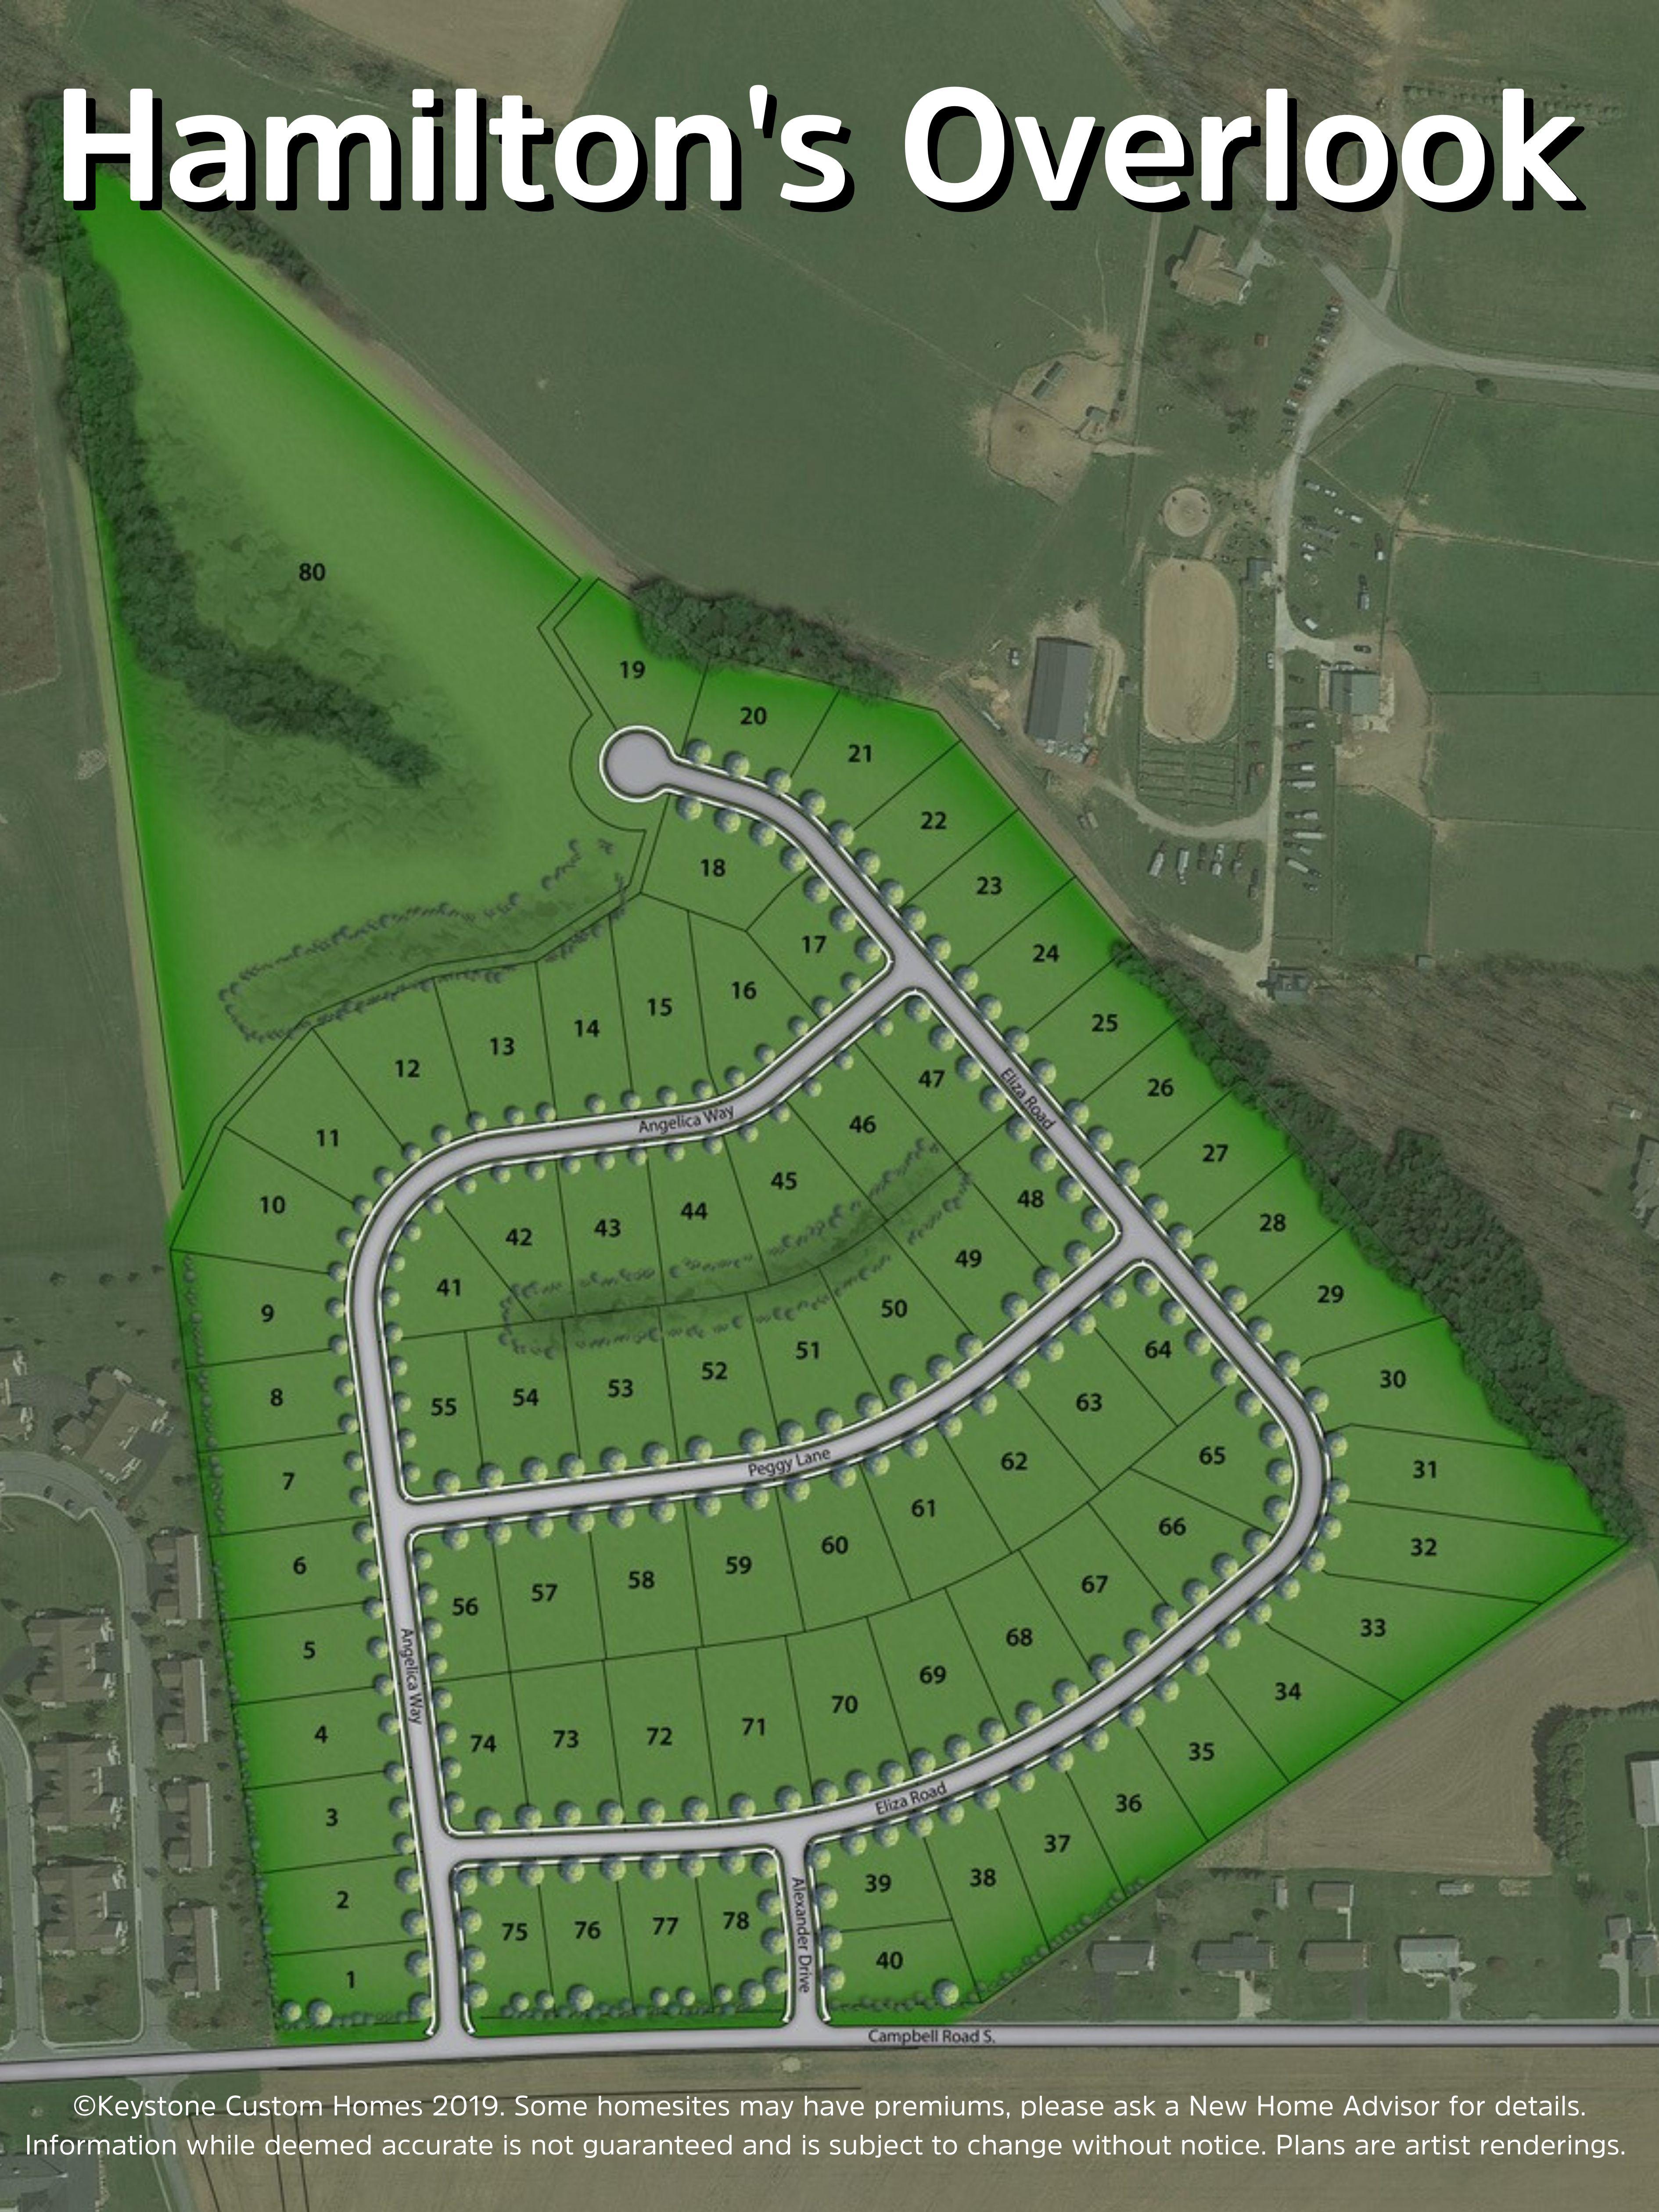 Hamilton's Overlook Lot Map Background